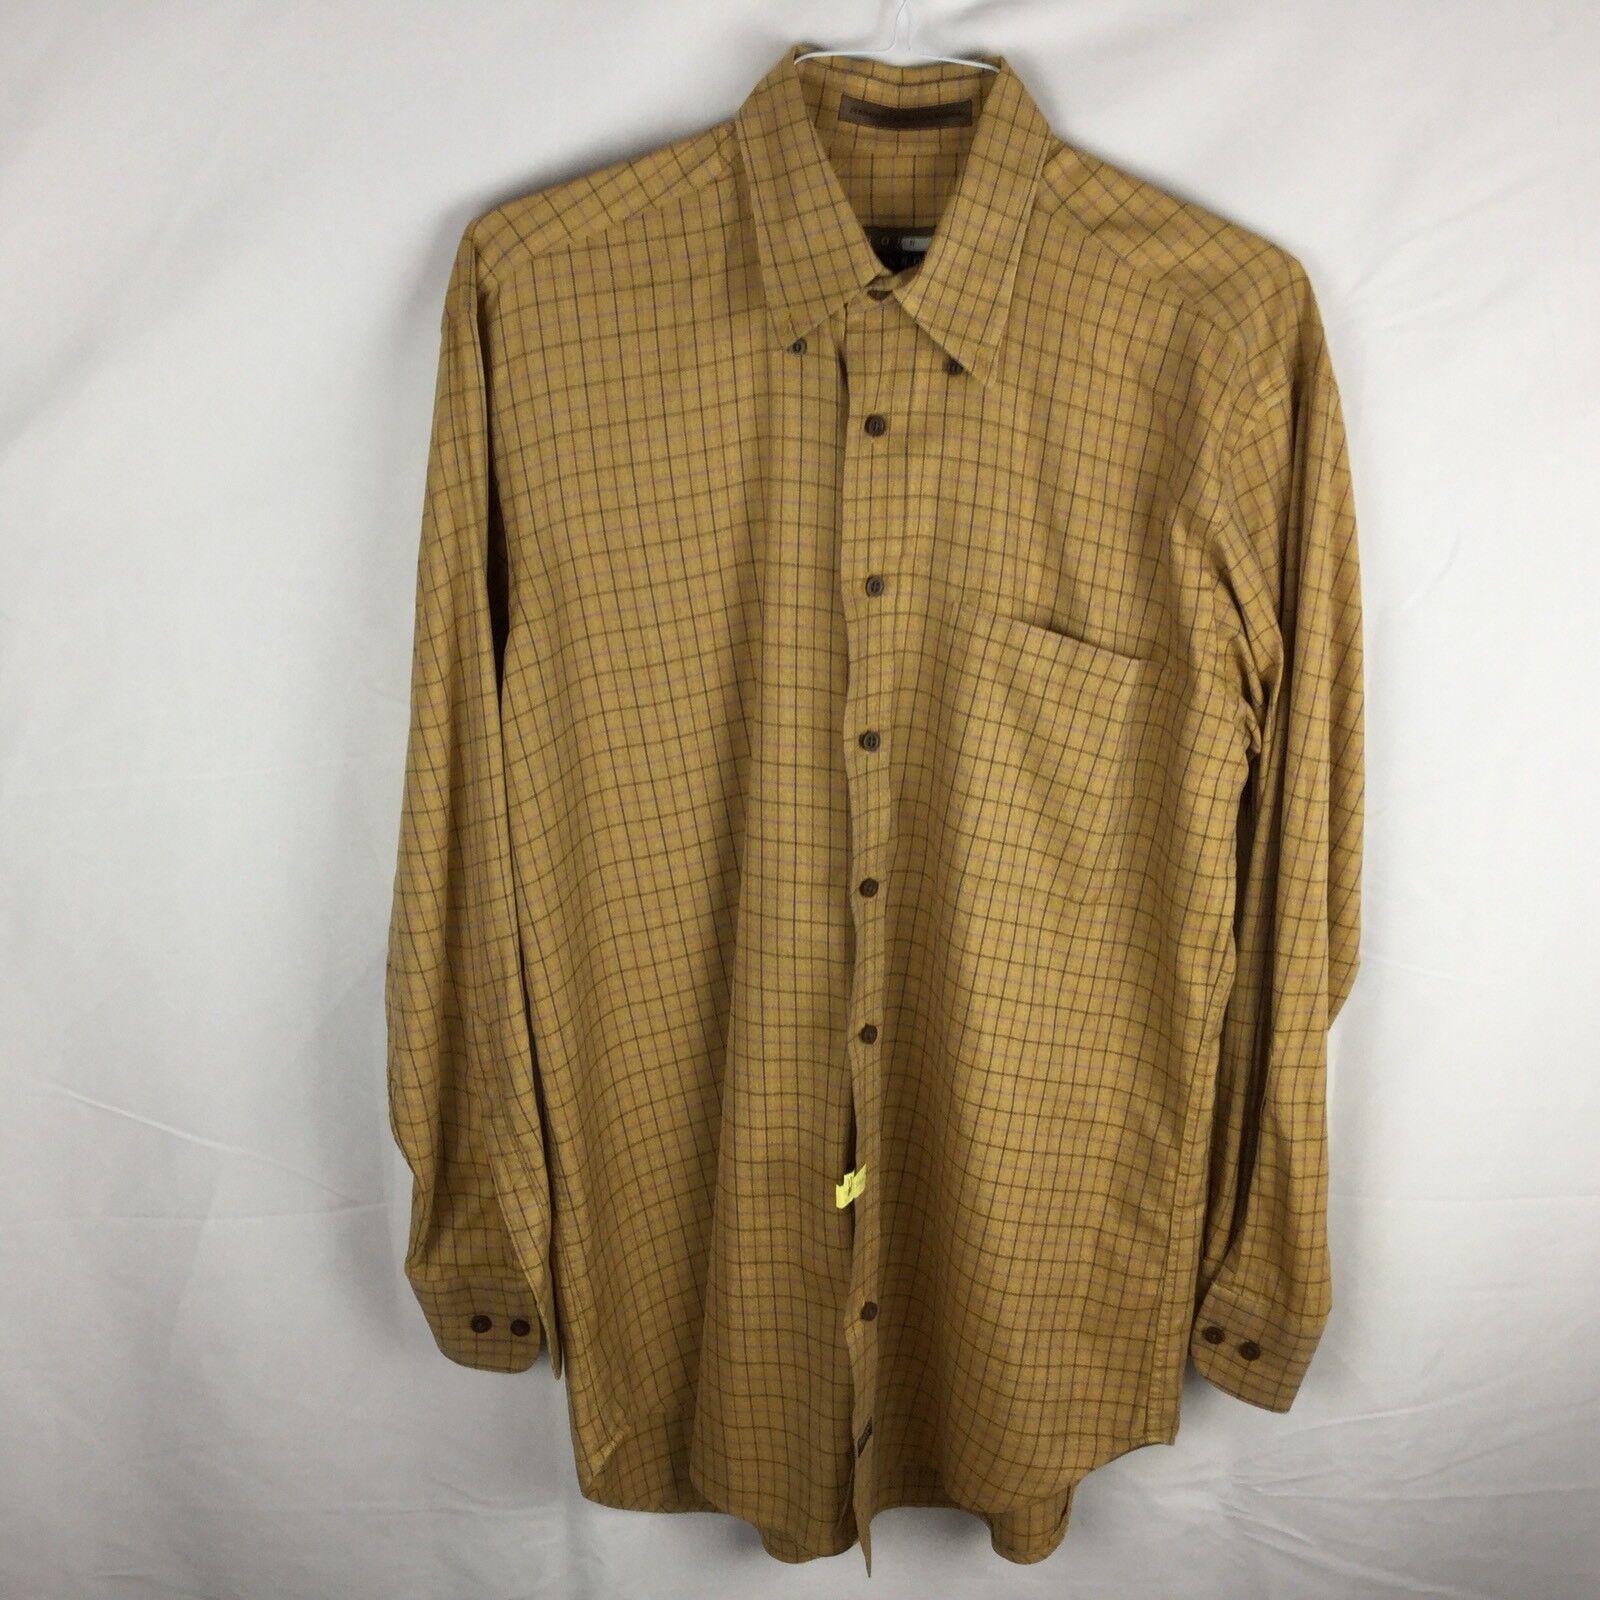 Robert Talbots Carmel CA Men's LS Medium Brown Windowpane Button Down Shirt